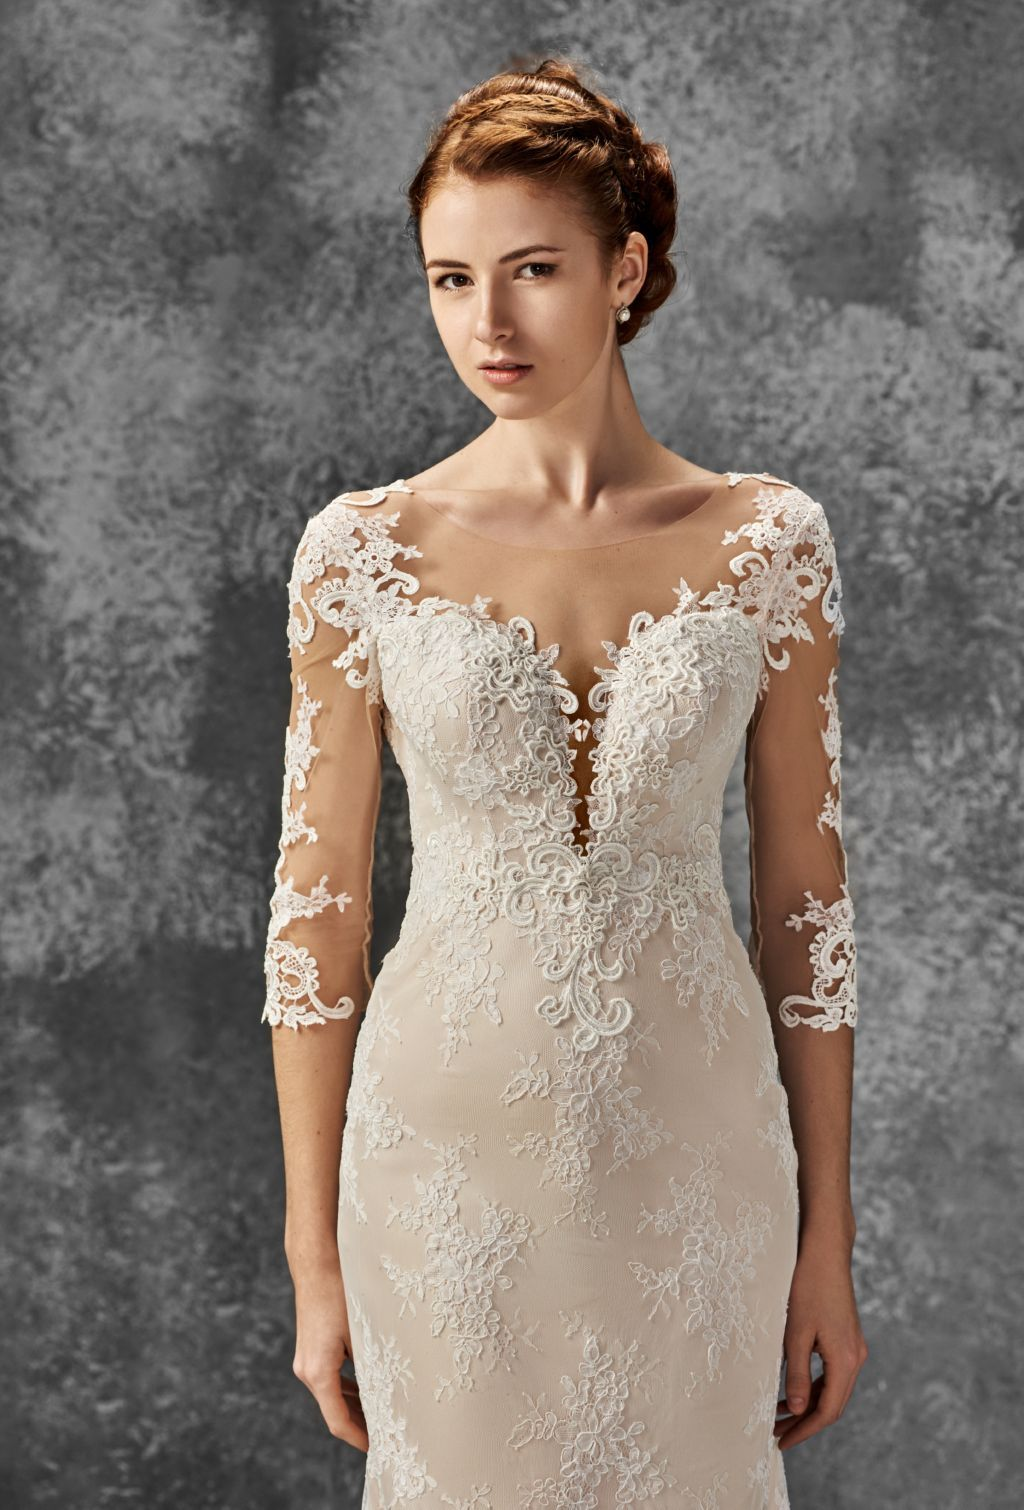 Boho wedding lace dress chic wedding dress ball gown wedding dress